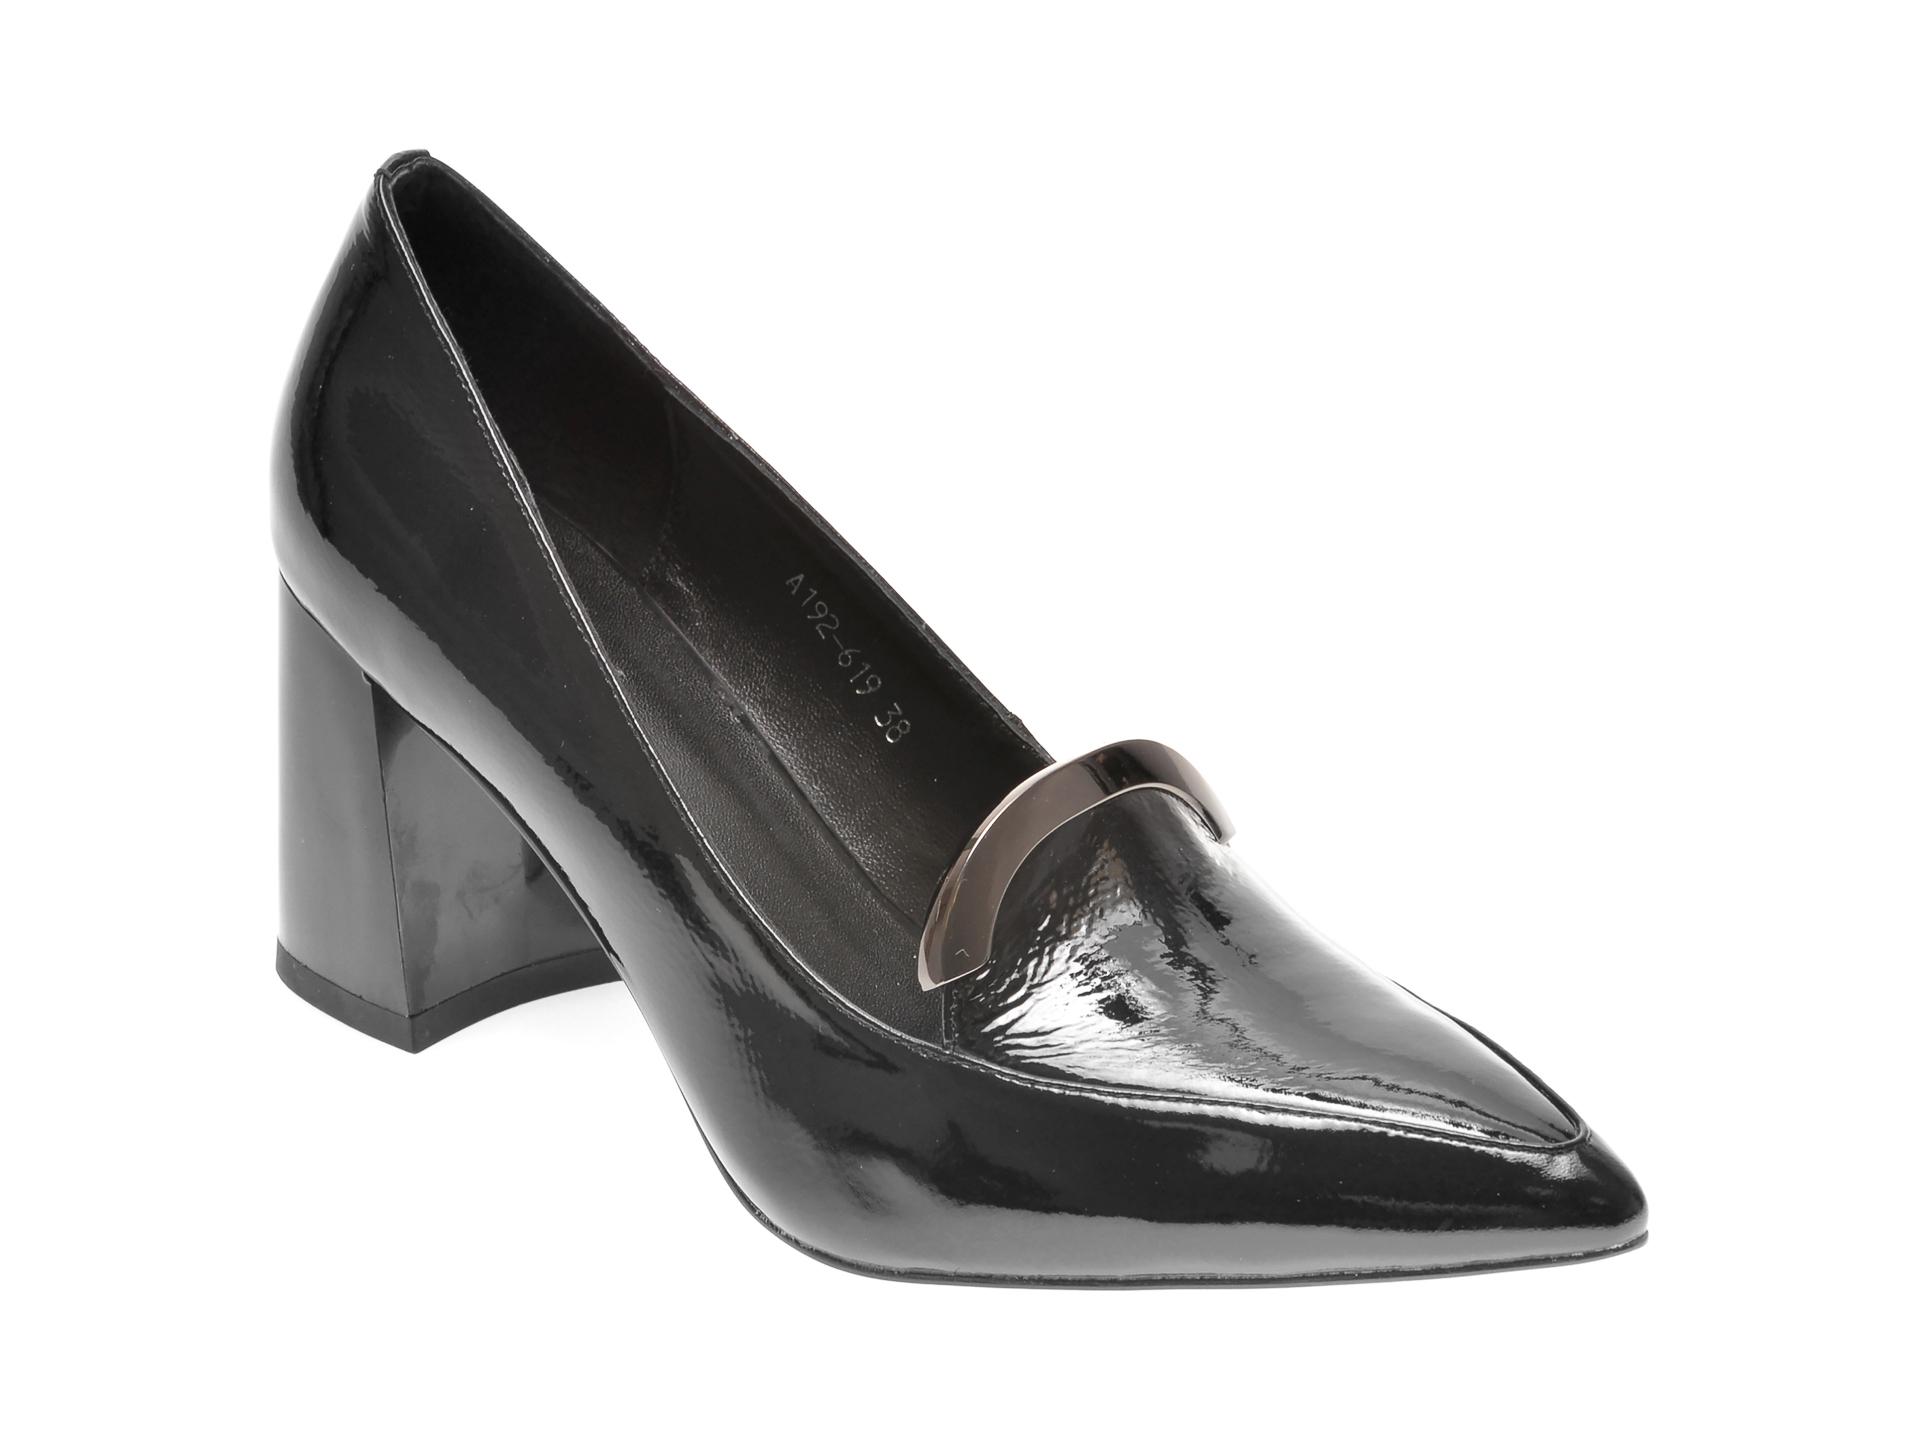 Pantofi EPICA negri, A192619, din piele naturala lacuita